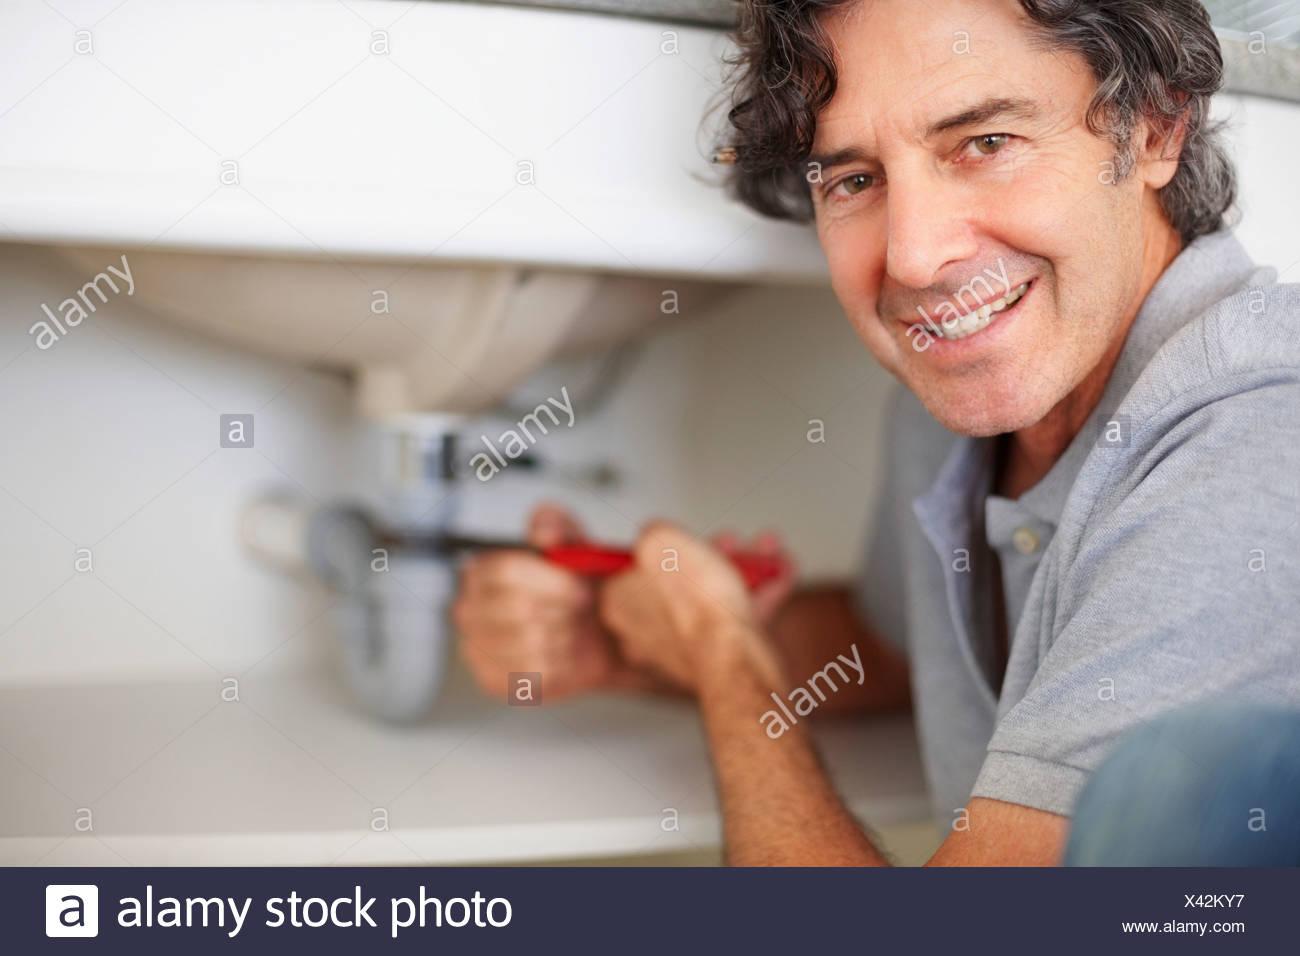 Portrait Plumber Fixing Sink Stock Photos & Portrait Plumber Fixing ...